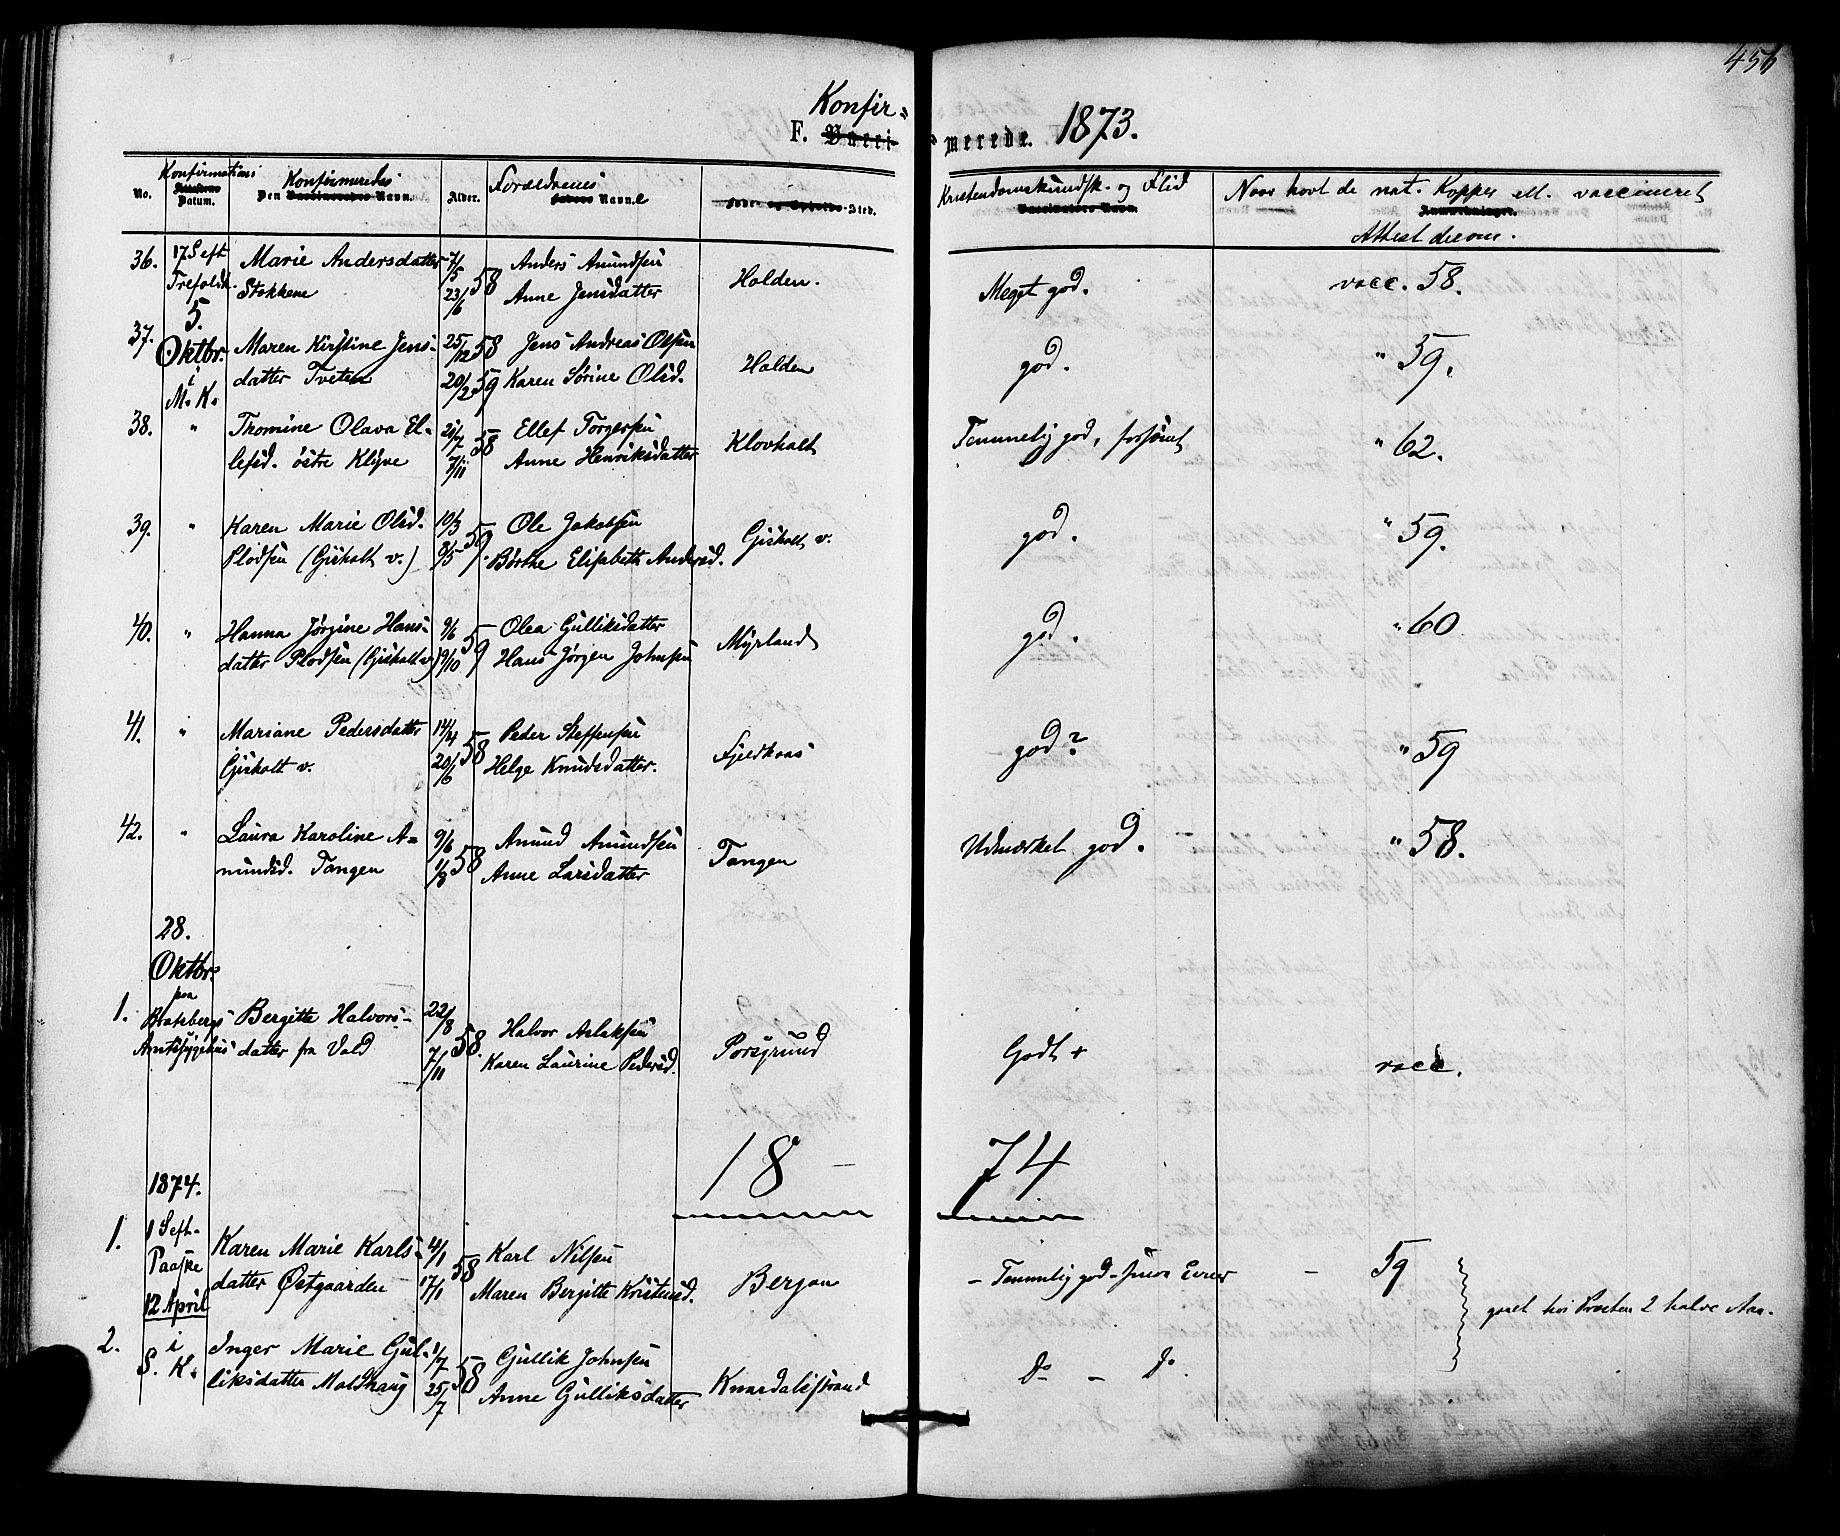 SAKO, Solum kirkebøker, F/Fa/L0008: Ministerialbok nr. I 8, 1865-1876, s. 456